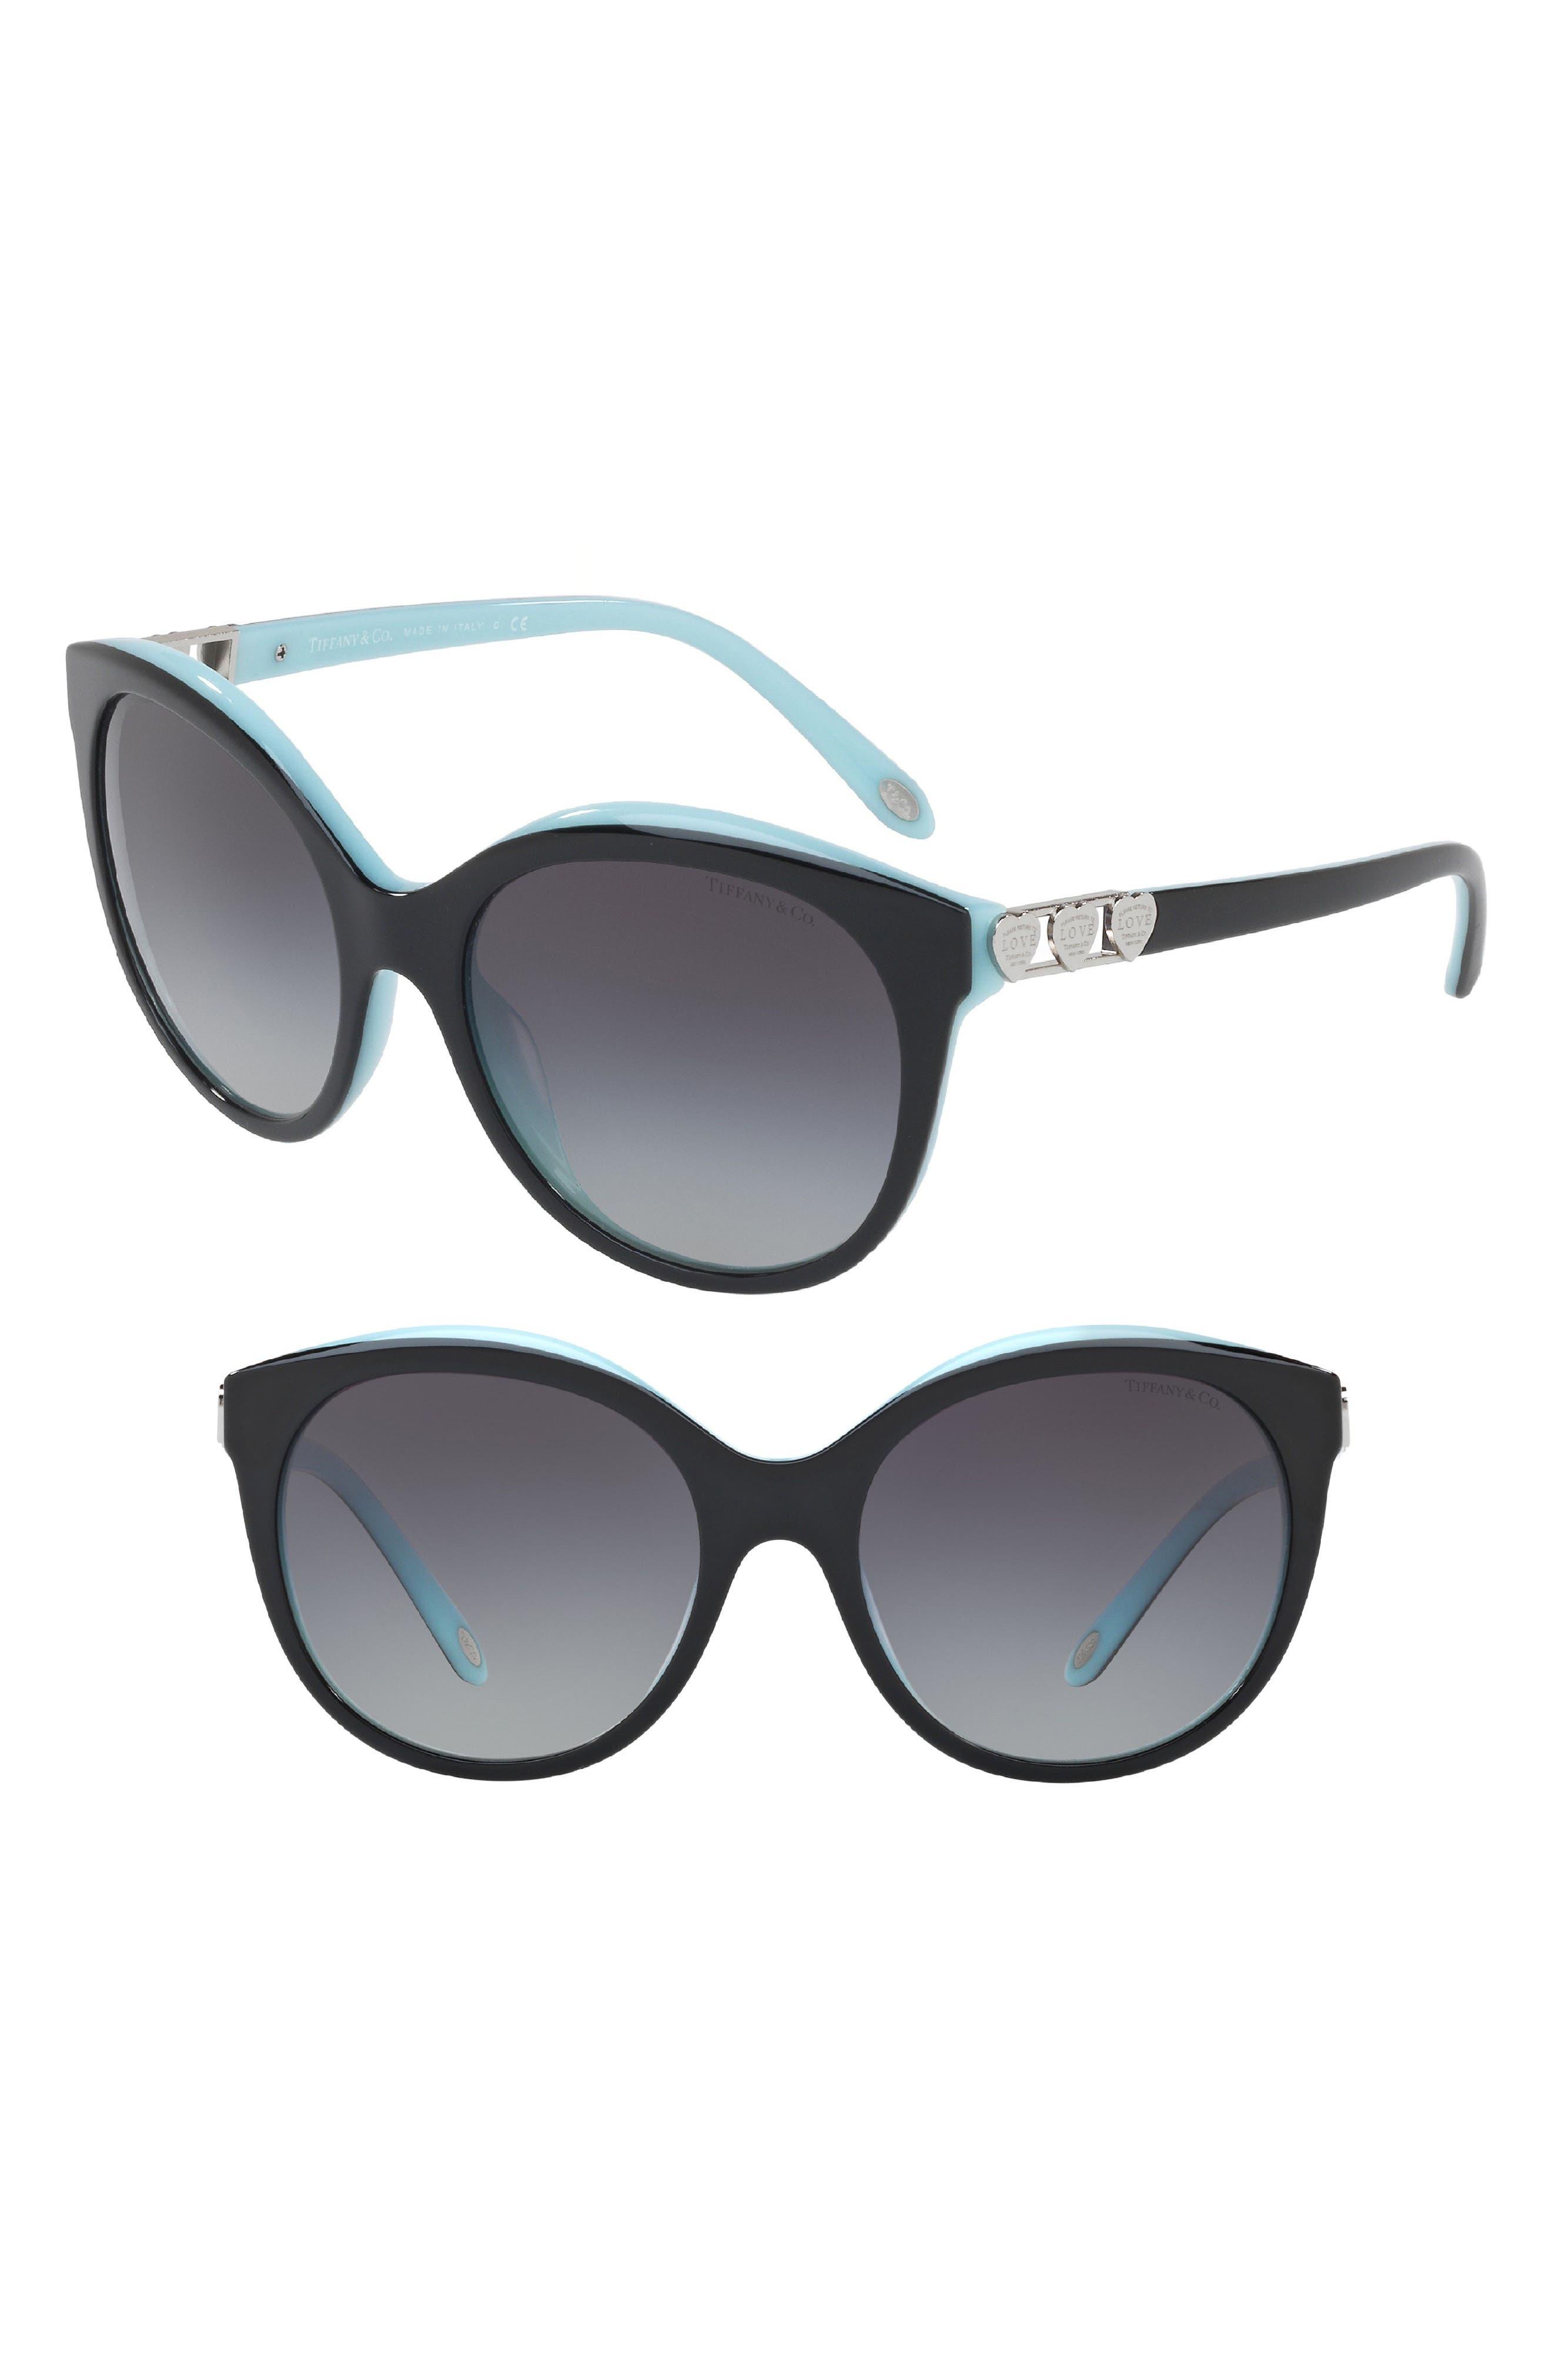 Tiffany 56mm Sunglasses,                             Main thumbnail 1, color,                             BLACK/ BLUE GRADIENT